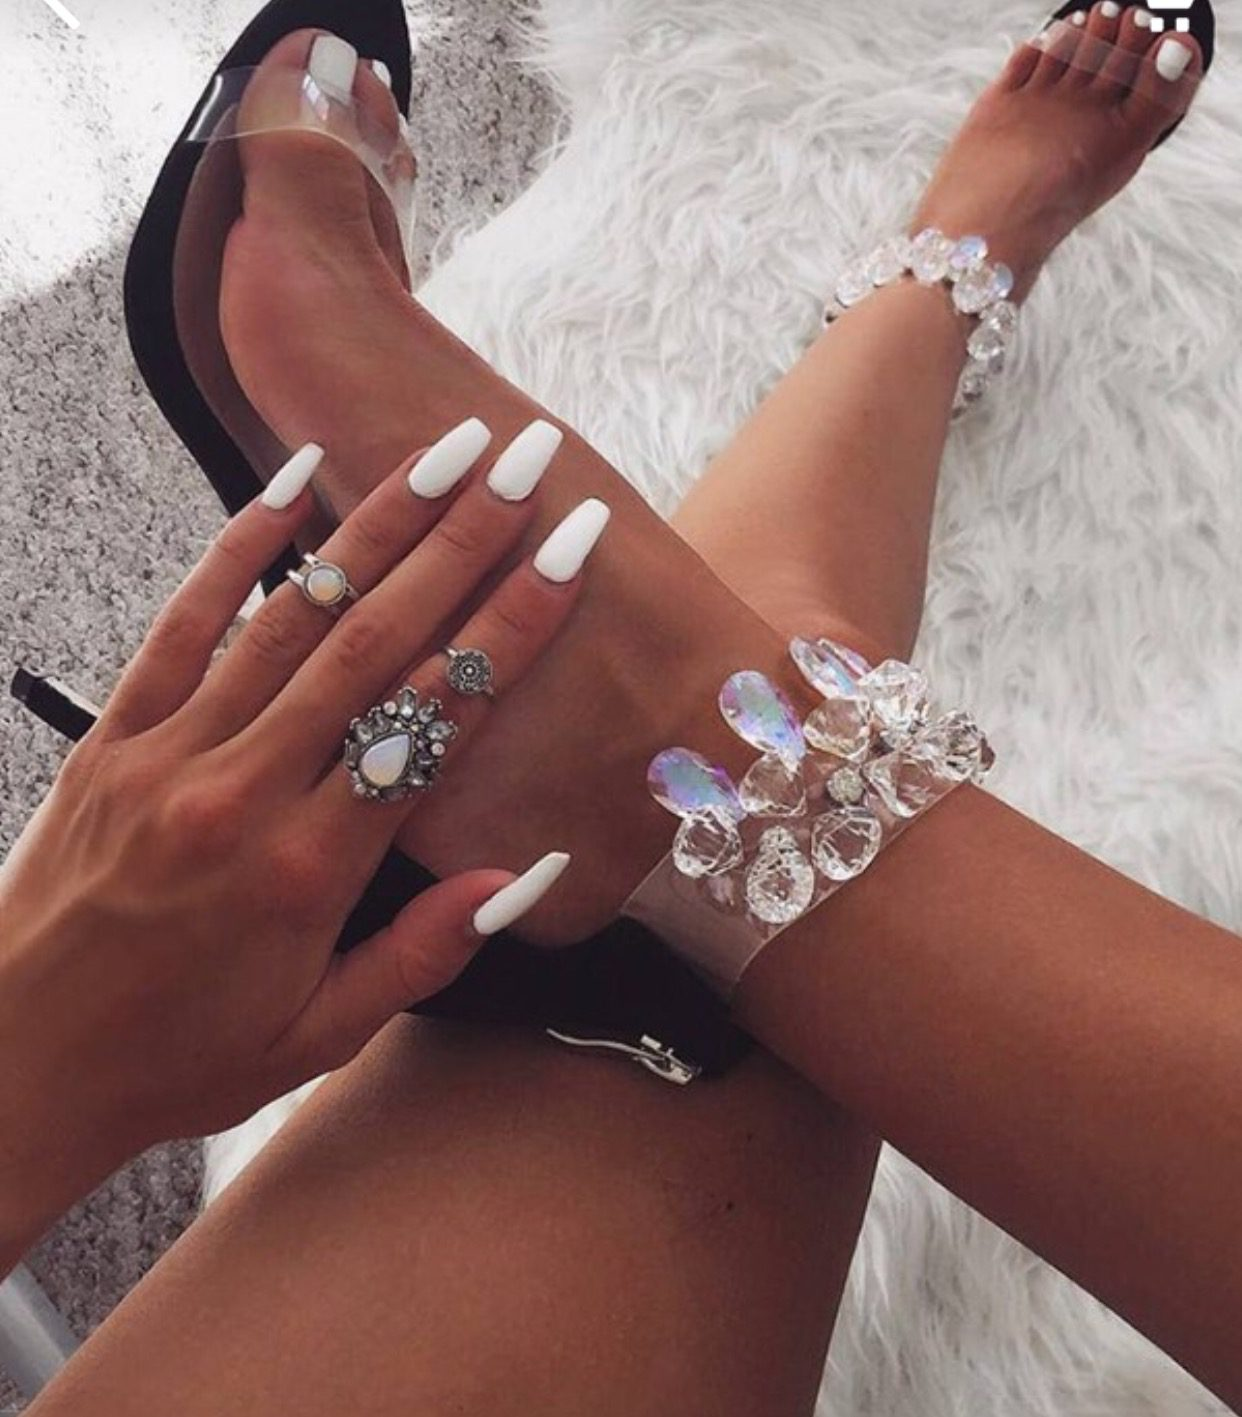 ee81defd2127 Glam Bling heels – Suzy Q Jewels